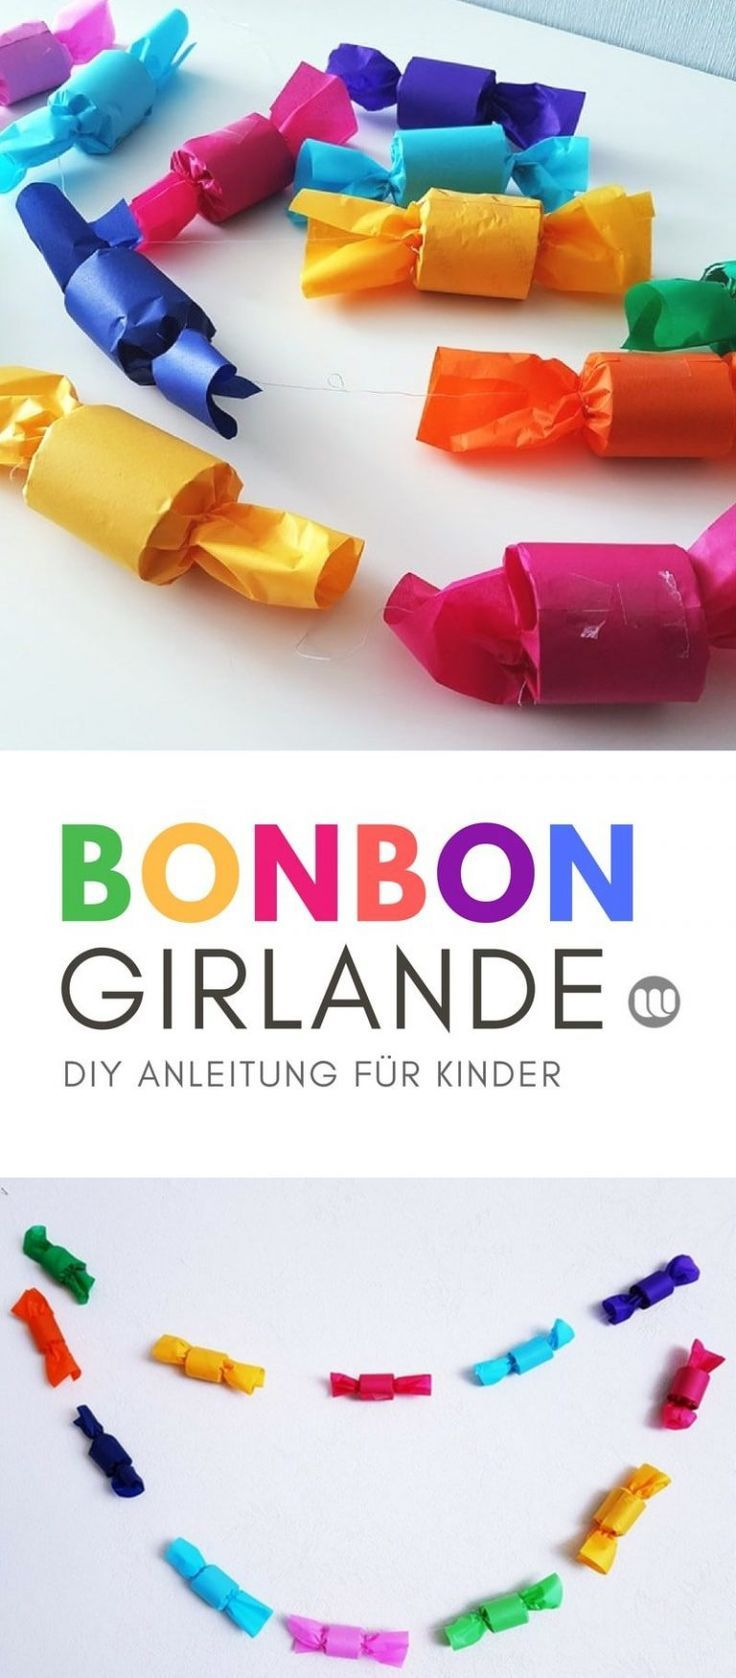 DIY Bonbon-Girlande: Basteln mit Klopapierrollen Upcycling